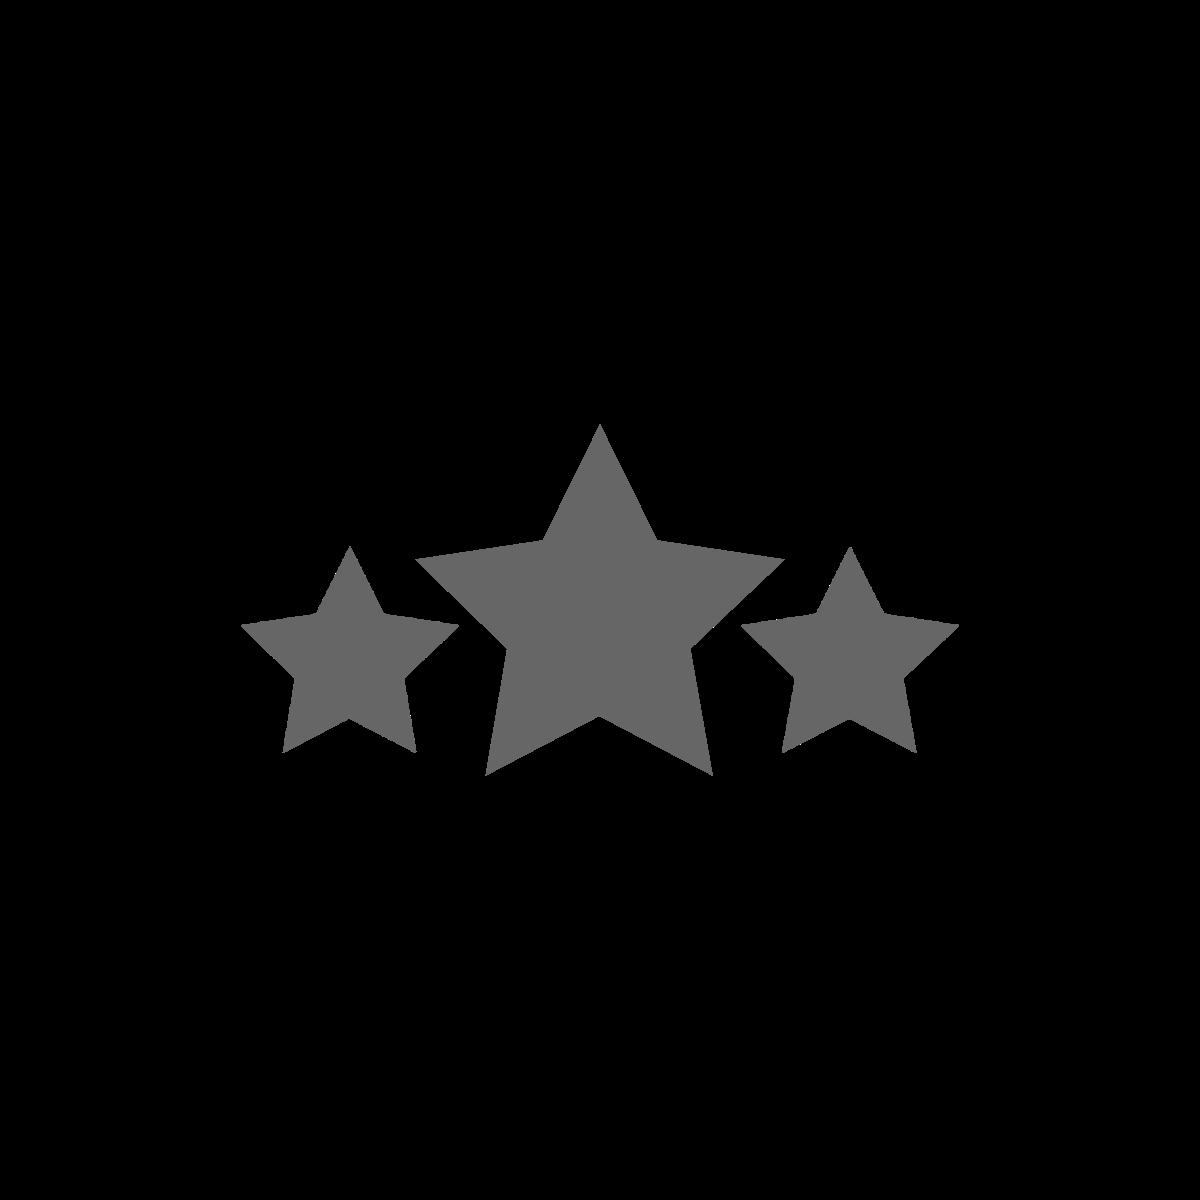 noun_Star_3346451